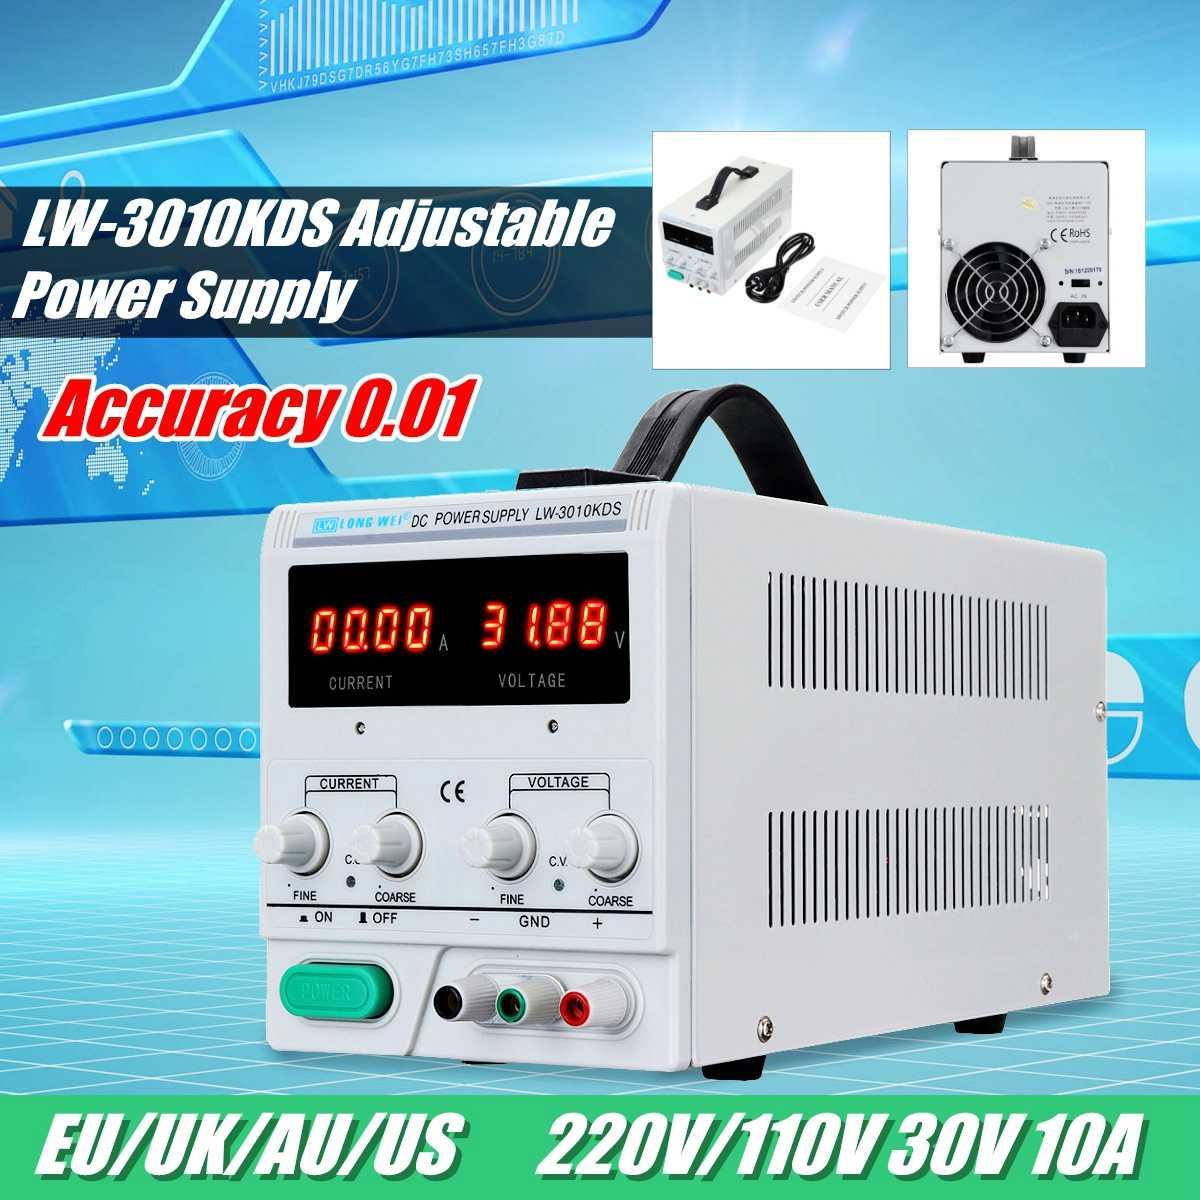 30 V 10A 110 V/220 V LED affichage régulateur de commutation réglable DC alimentation ordinateur portable réparation réparation précision 0.01 réglage fin